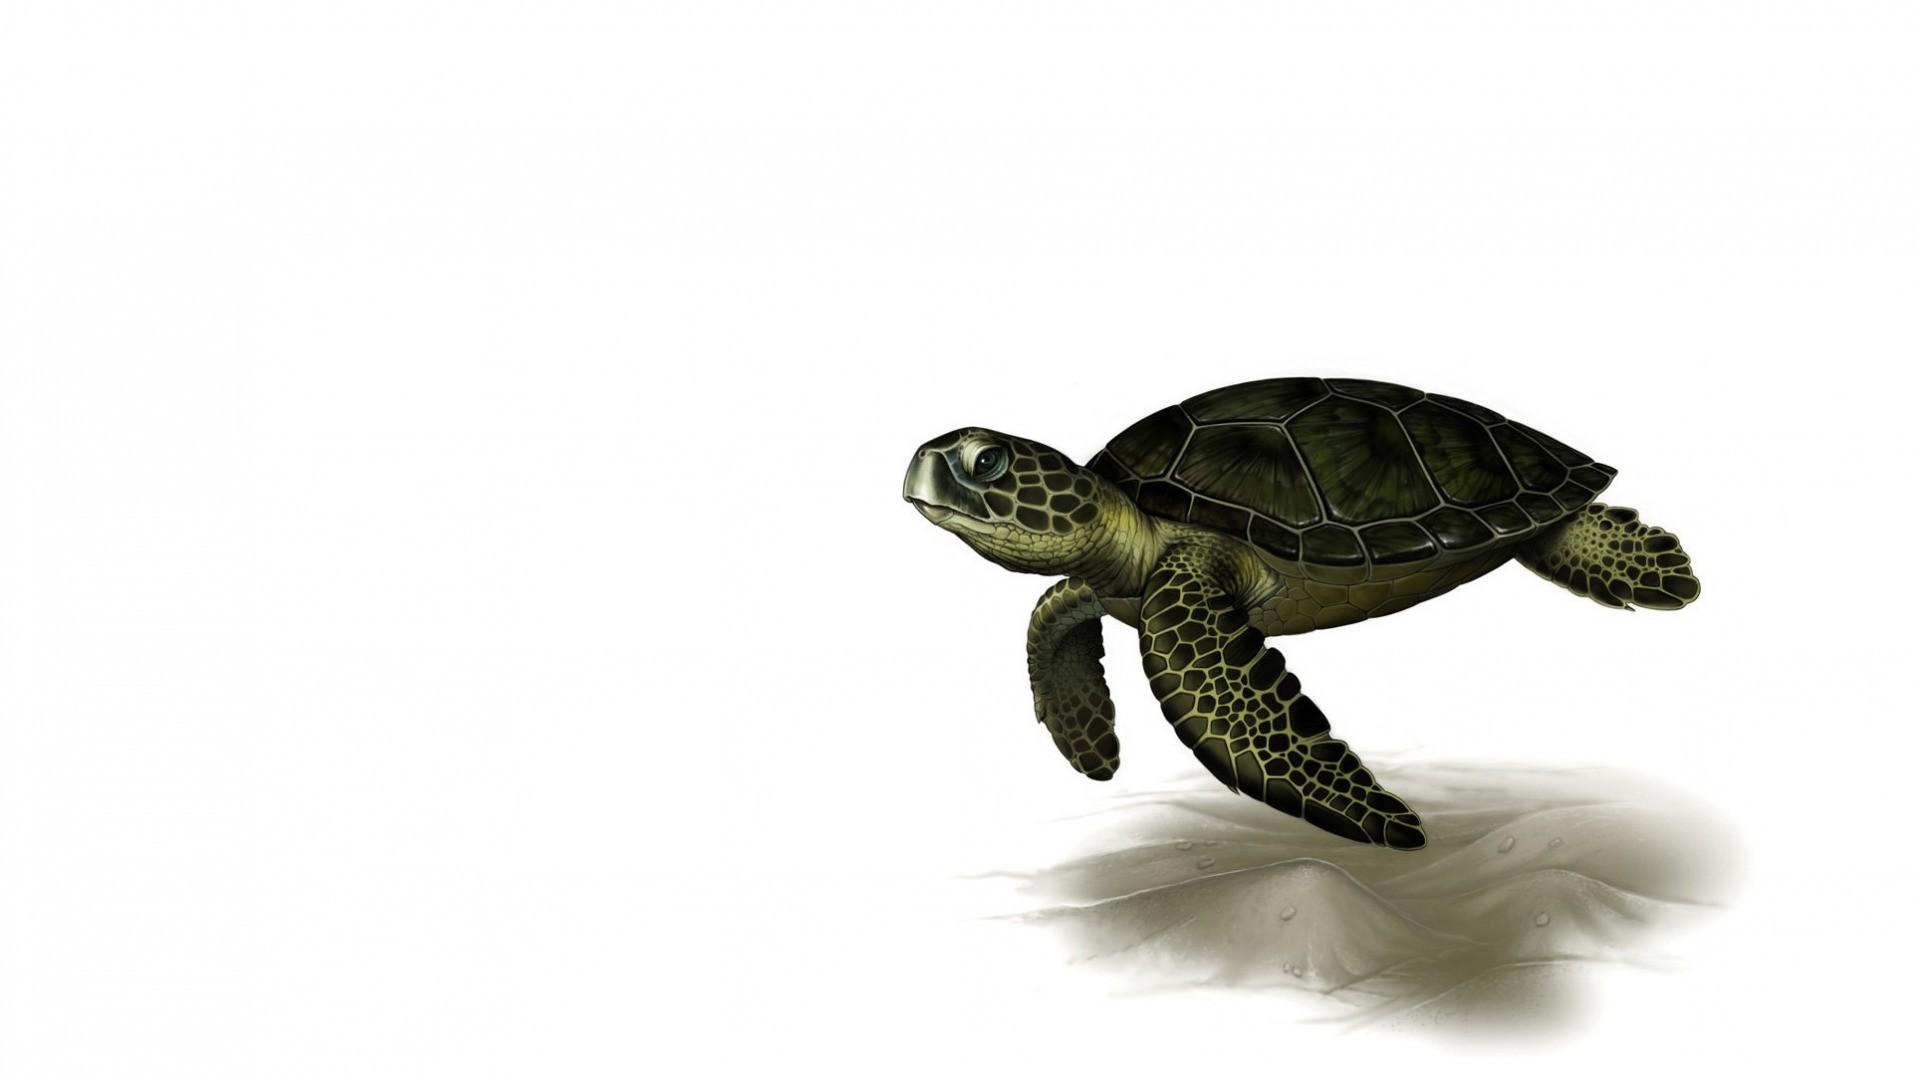 Turtle Minimalist wallpaper photo hd